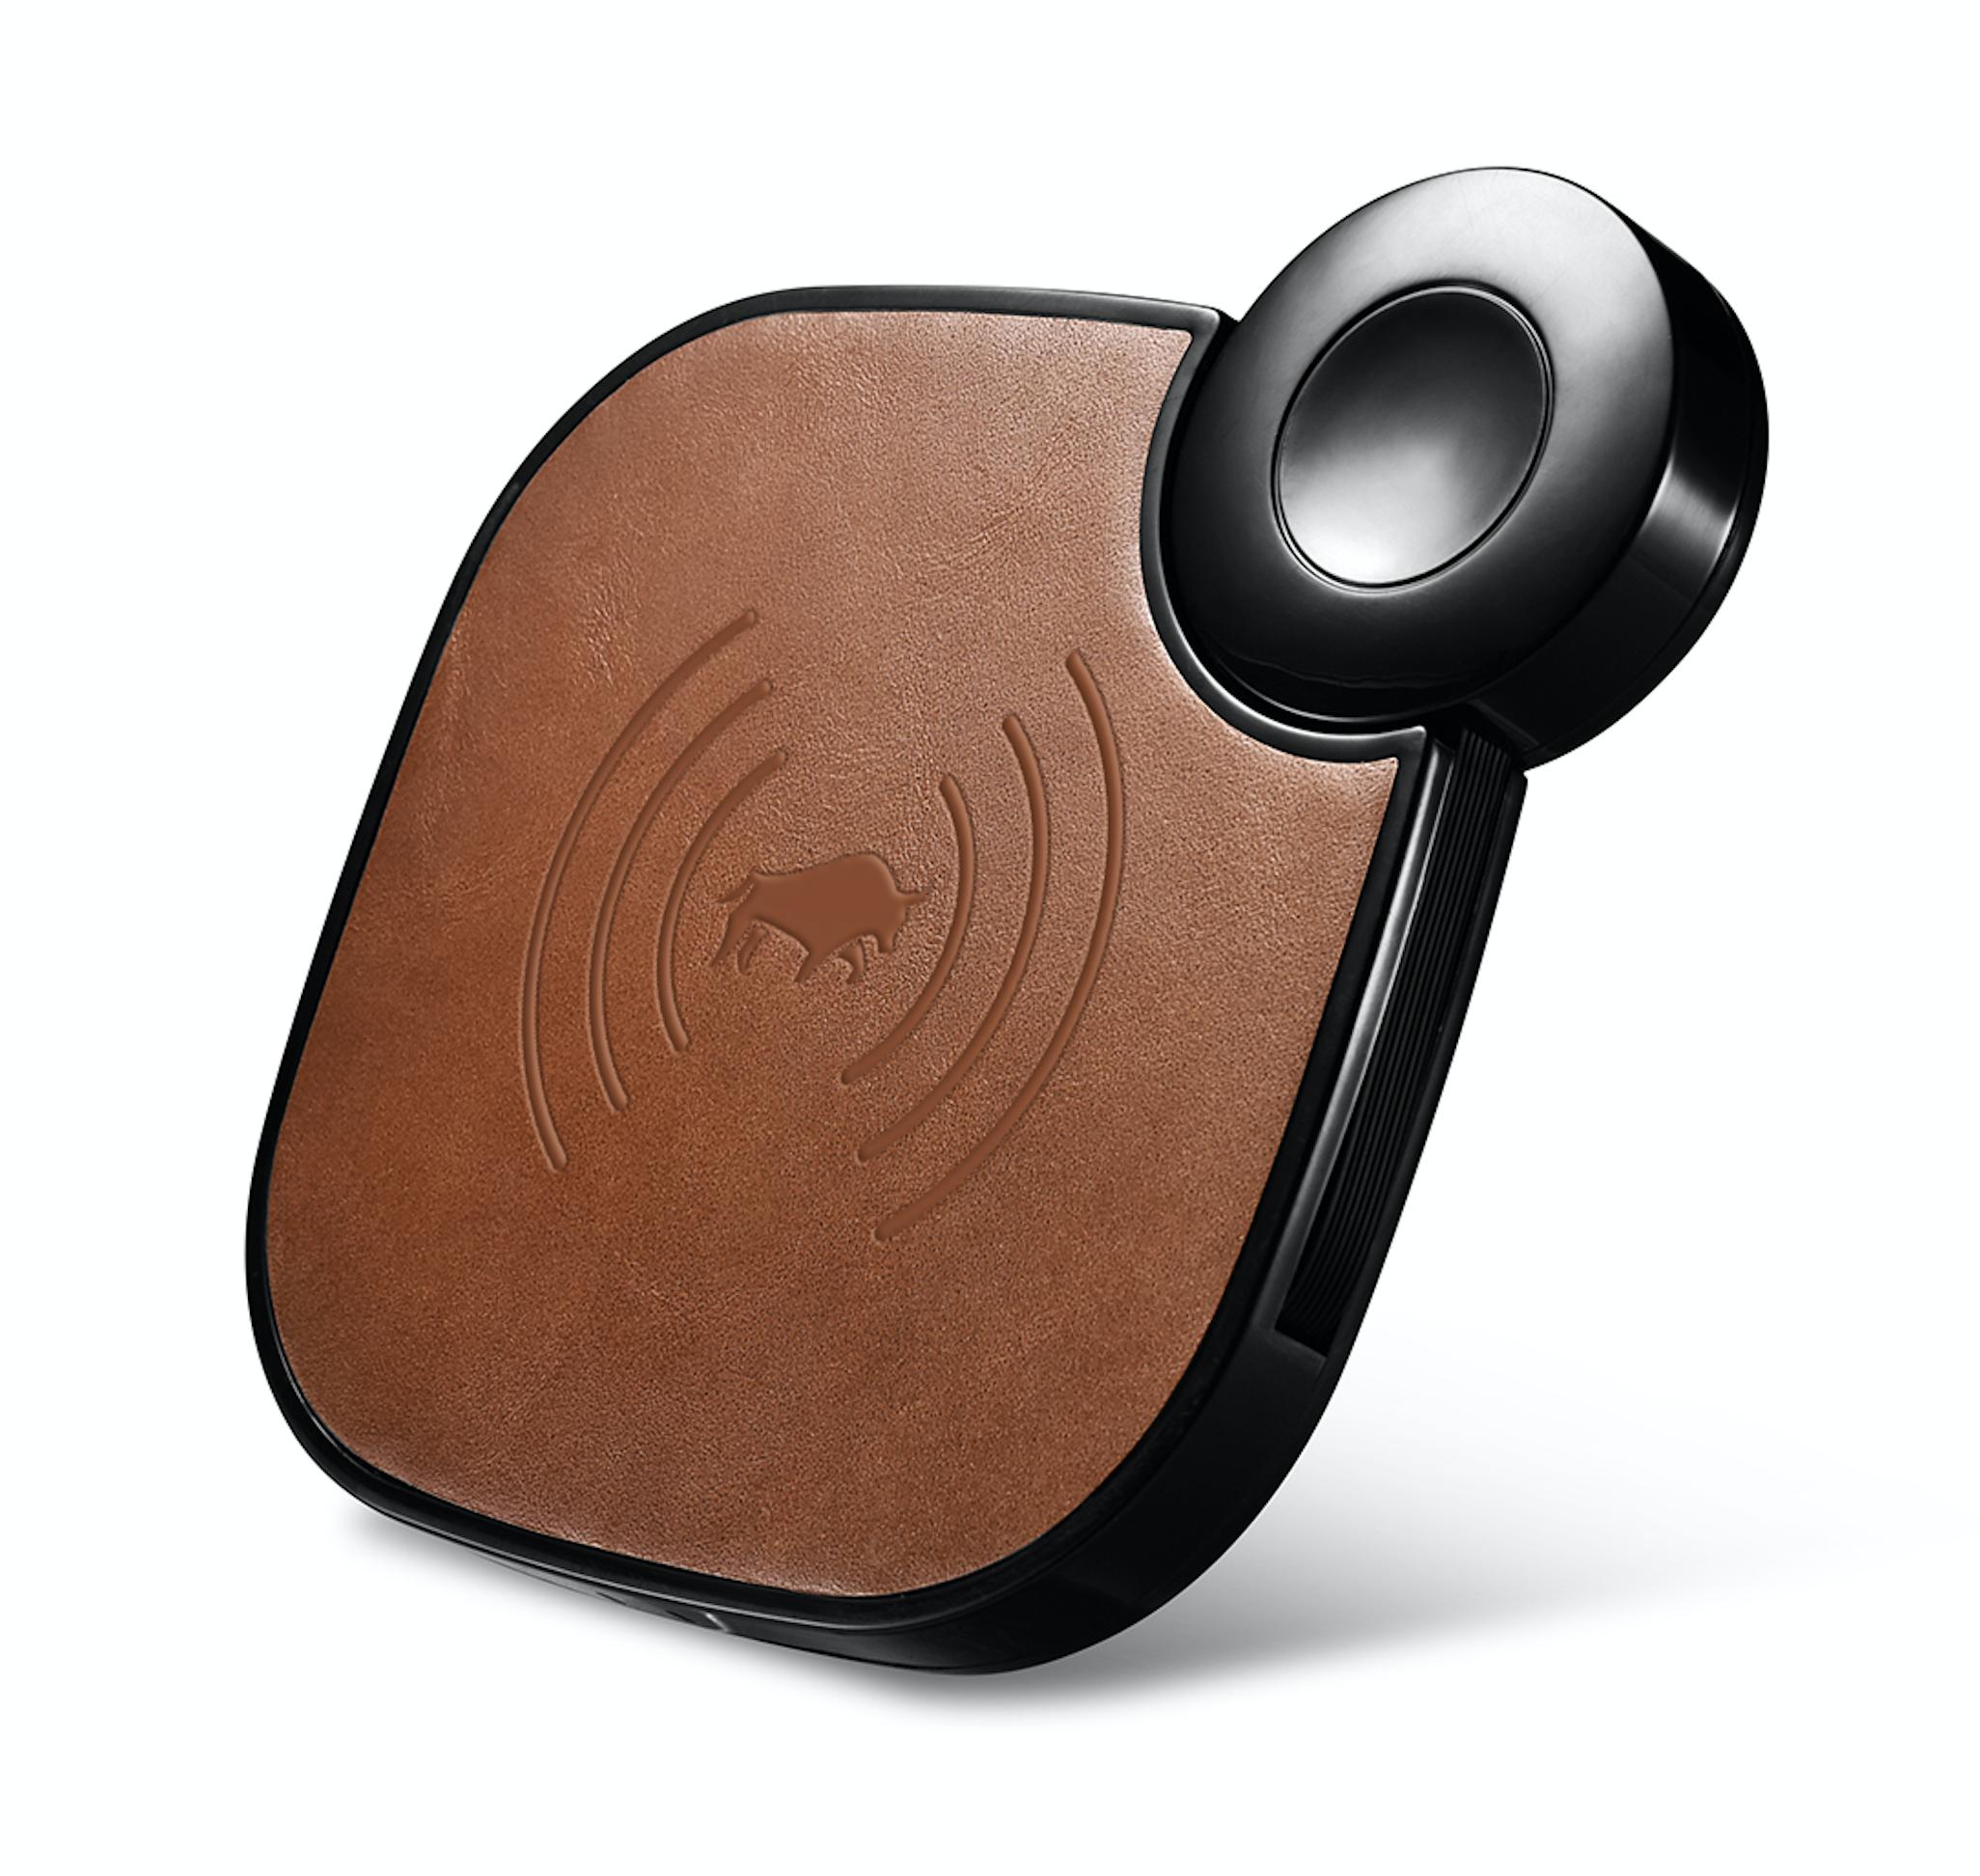 Kabelloses Ladegerät 2in1 passend zu Handy + Apple Watch